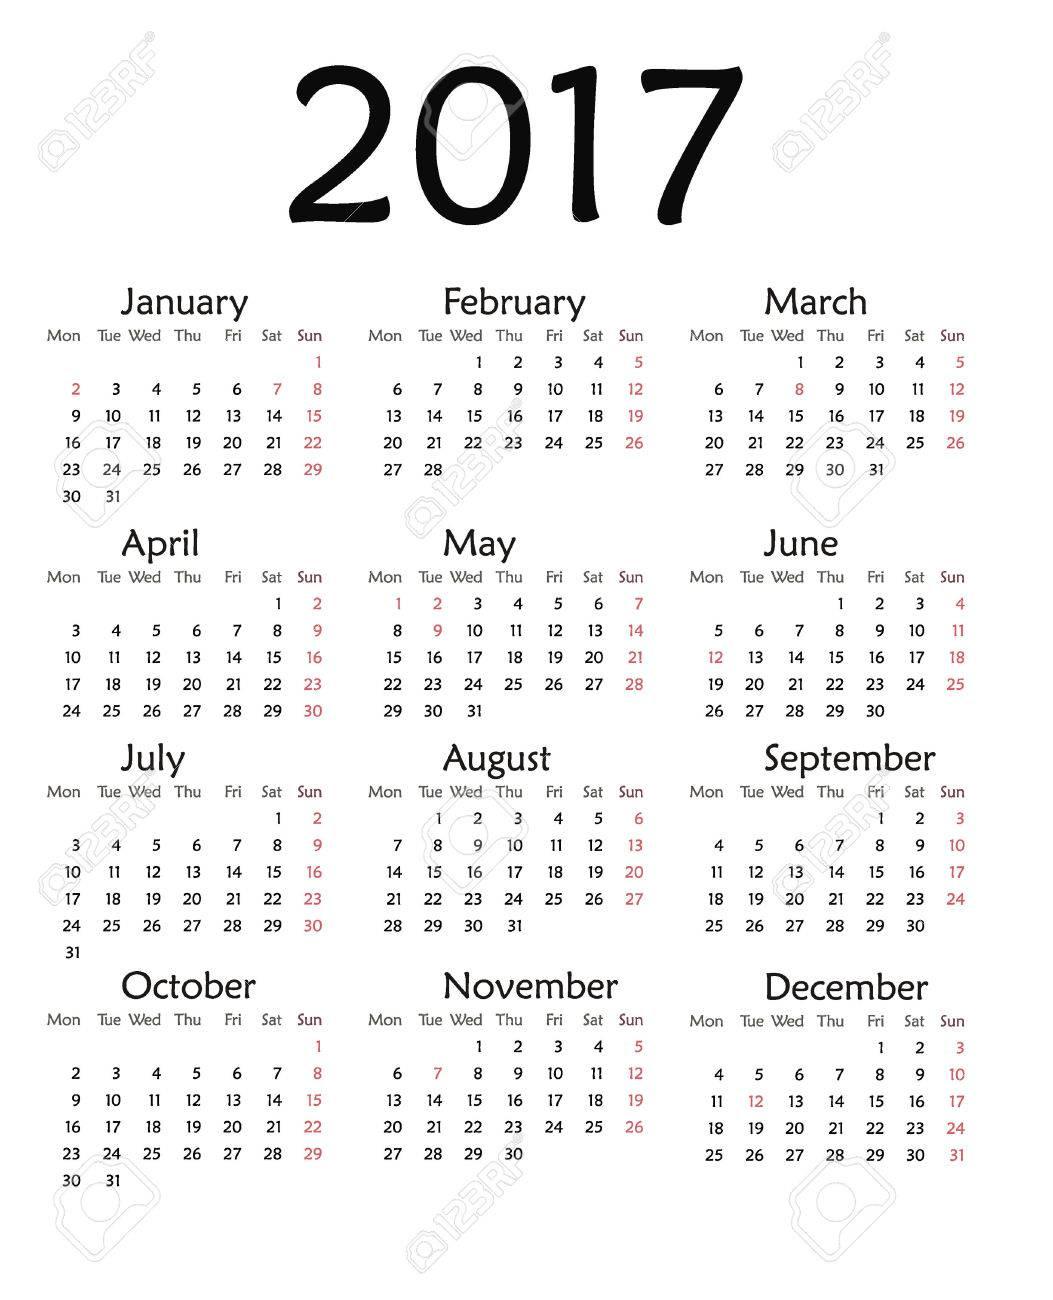 Simple Calendar For 2017. Vector Template Design Monthly Date Illustration  2017 Calendar Week Organizer Simple Number. Organizer Date 2017 Year